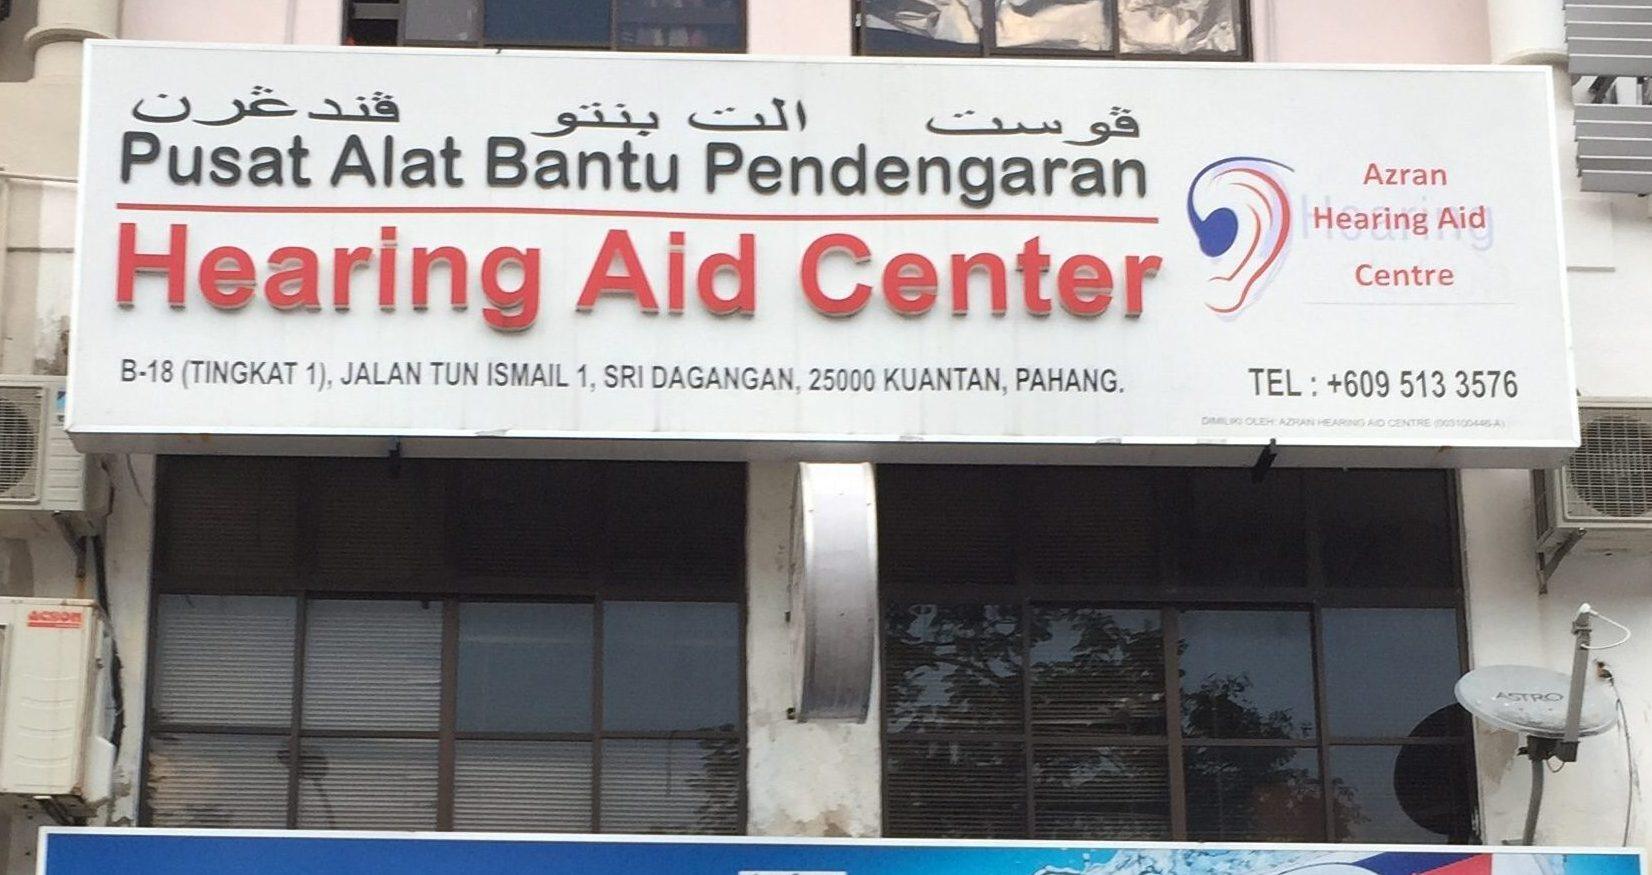 Azran HG Aid Centre